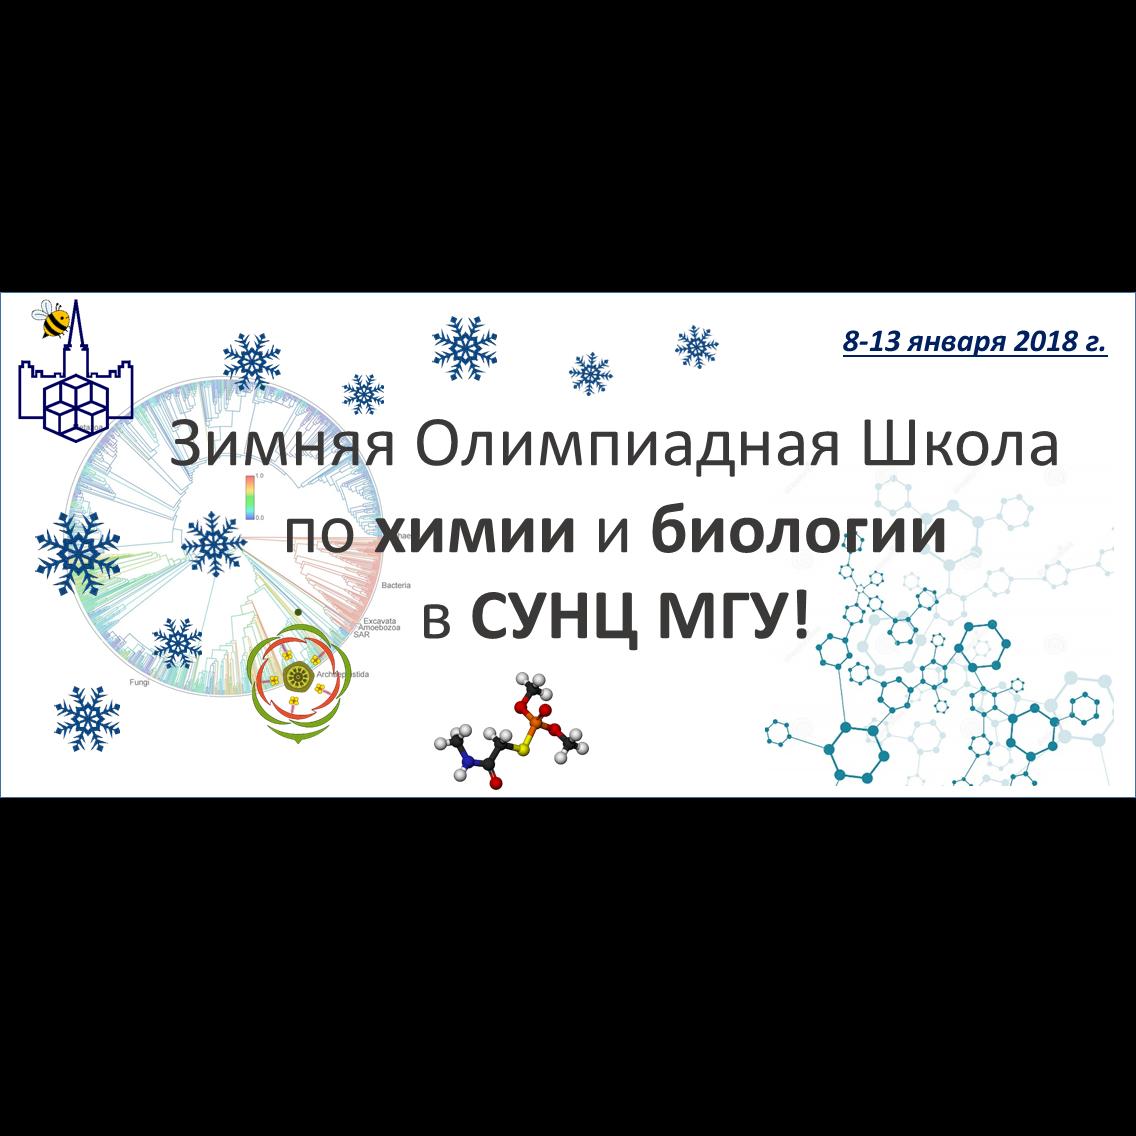 Зимняя олимпиадная школа по химии и биологии в СУНЦ МГУ — 2018